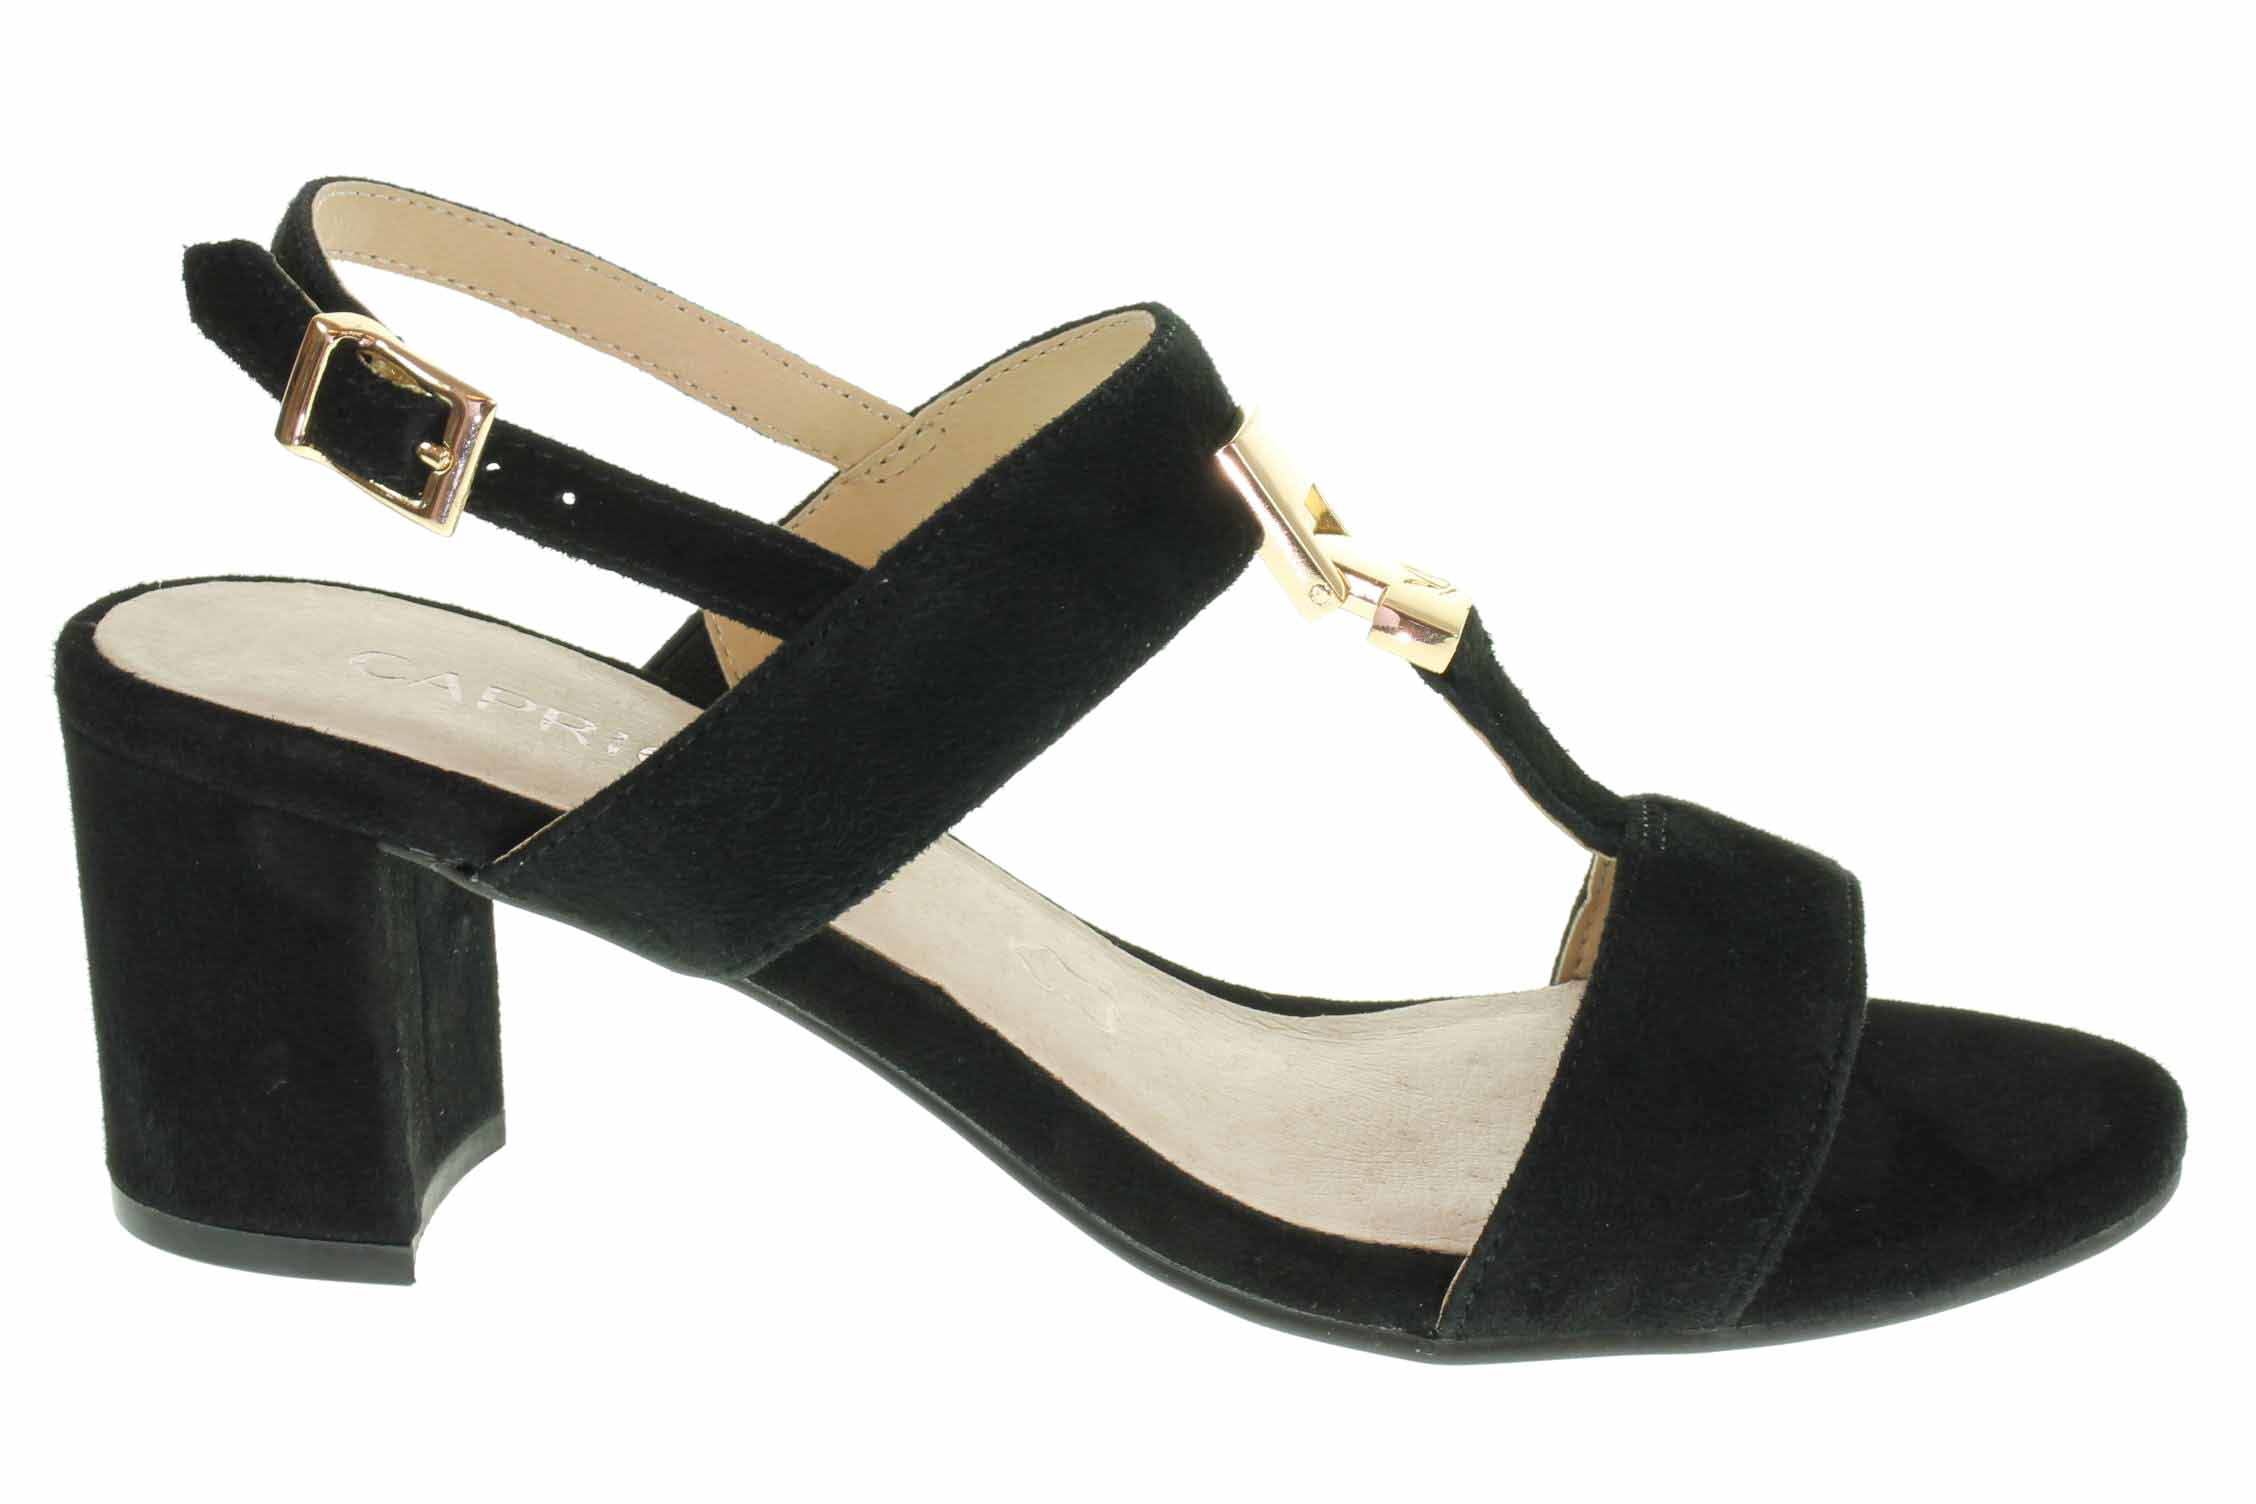 83ed56d1bc Dámské sandály